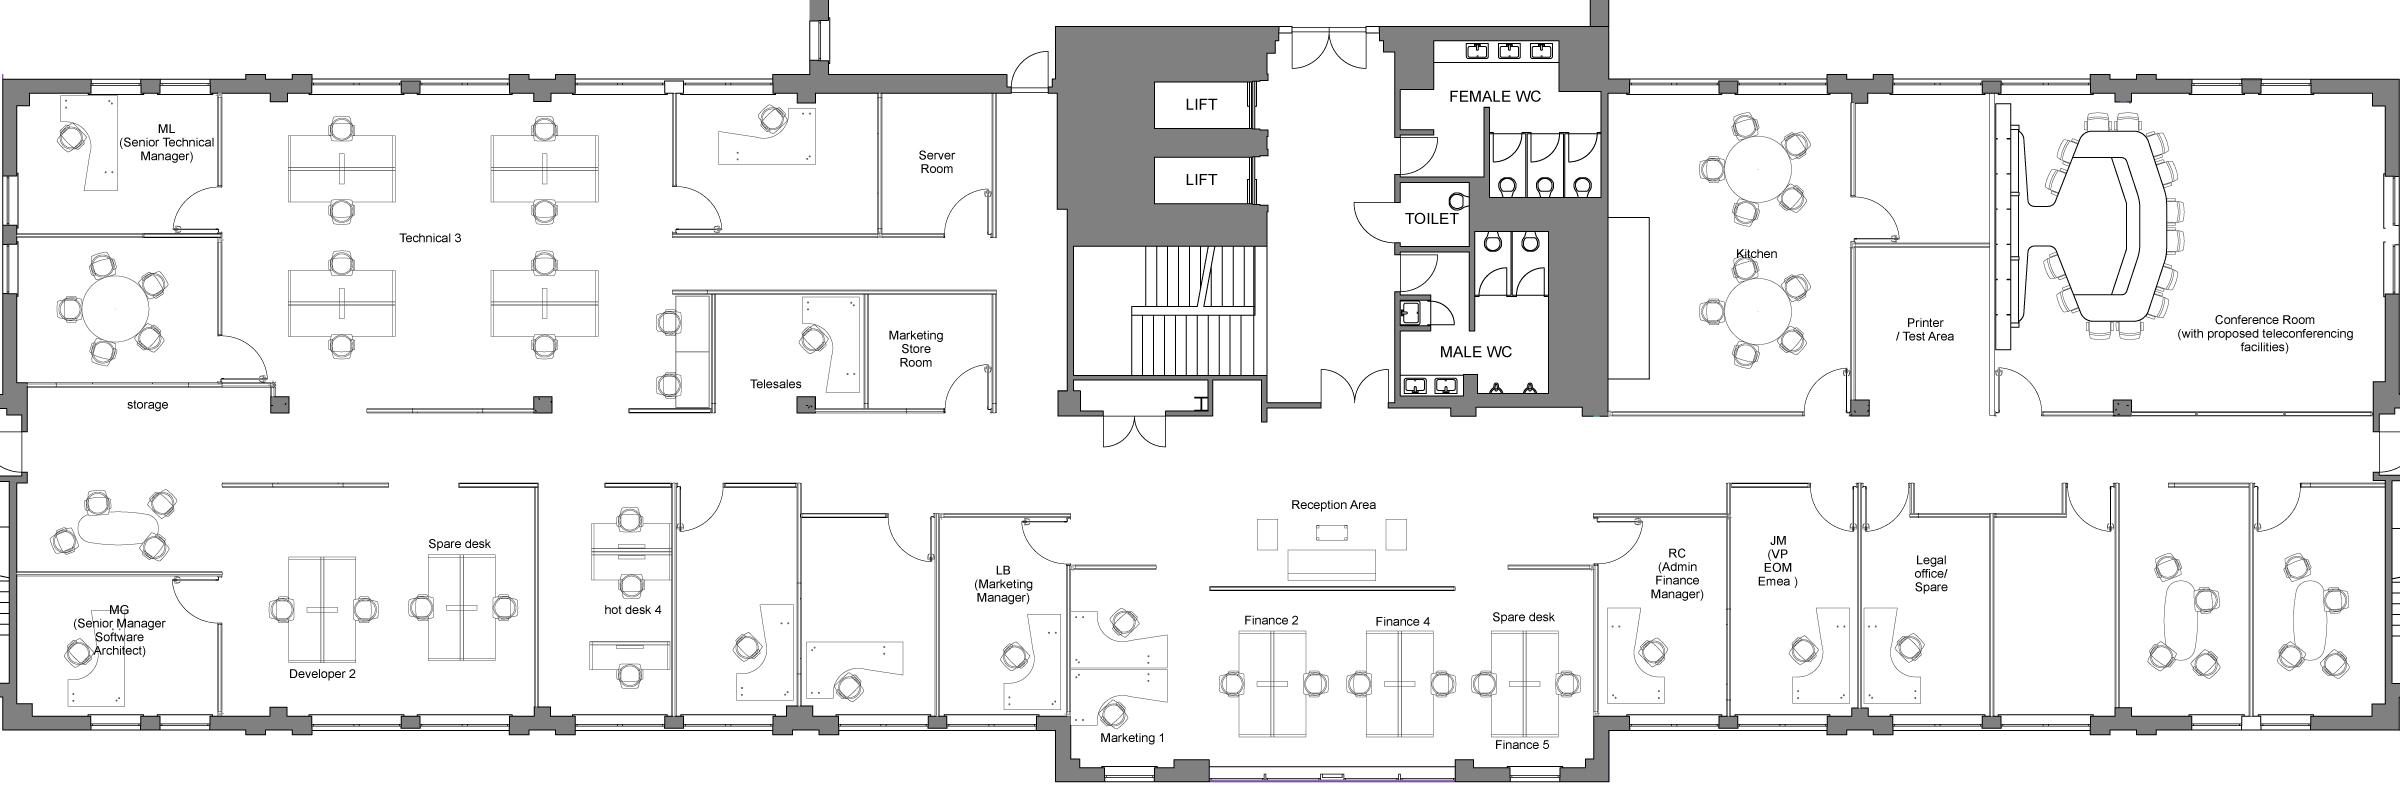 Floor Plans 2d 3d Cad Bim Services Revit In Cheltenham Tewkesbury And Gloucester Uk